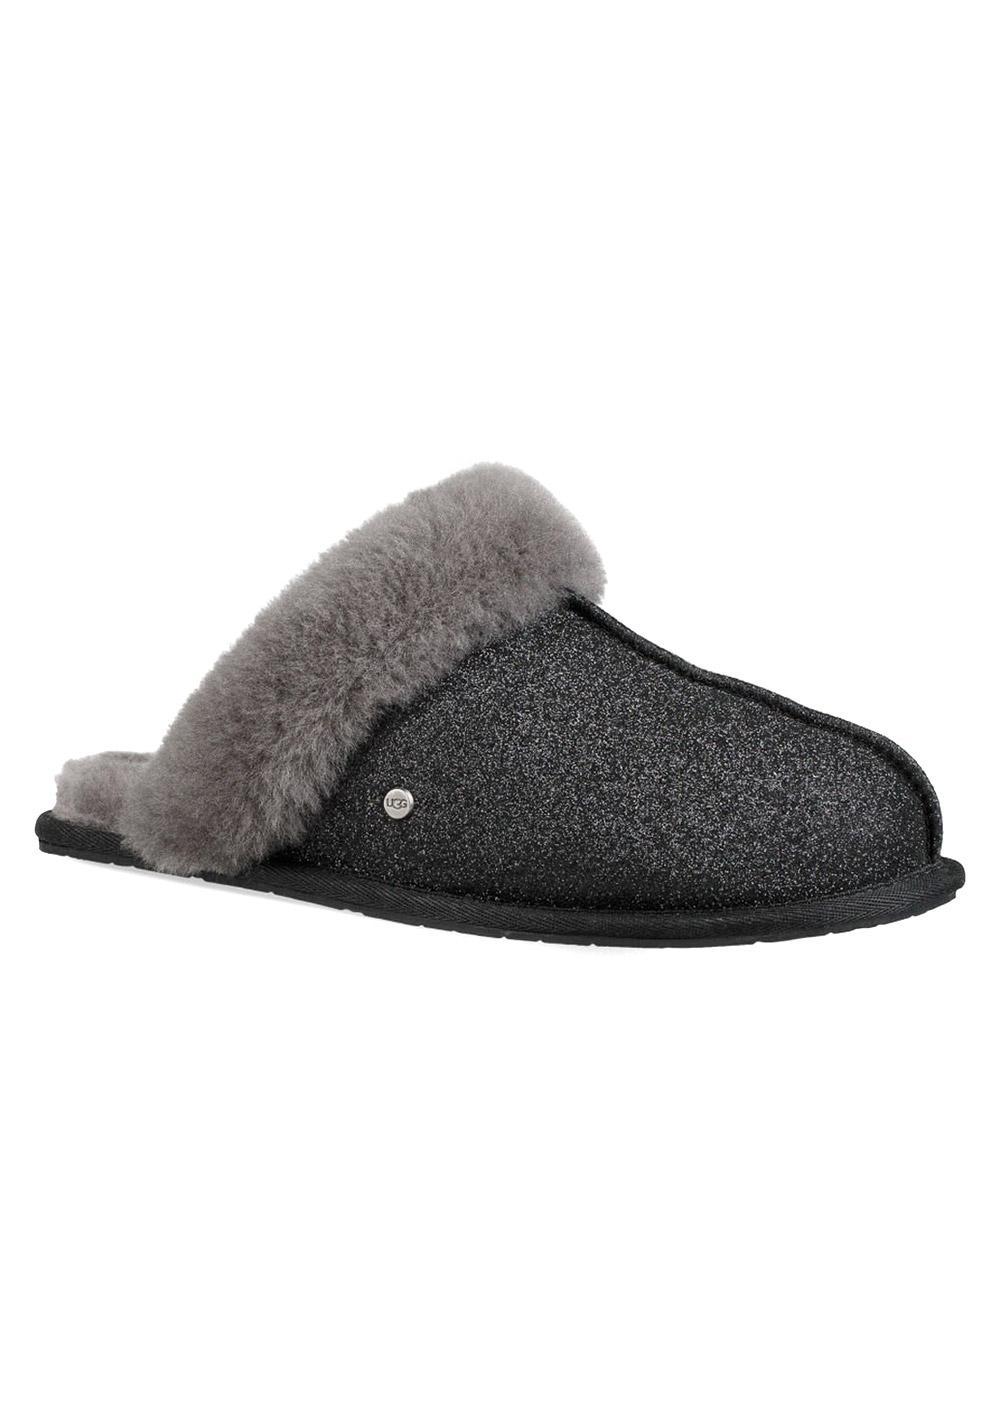 w) Sandale UGG Scuffette II Sparkle Größe: 39 Farbe: Schwarz